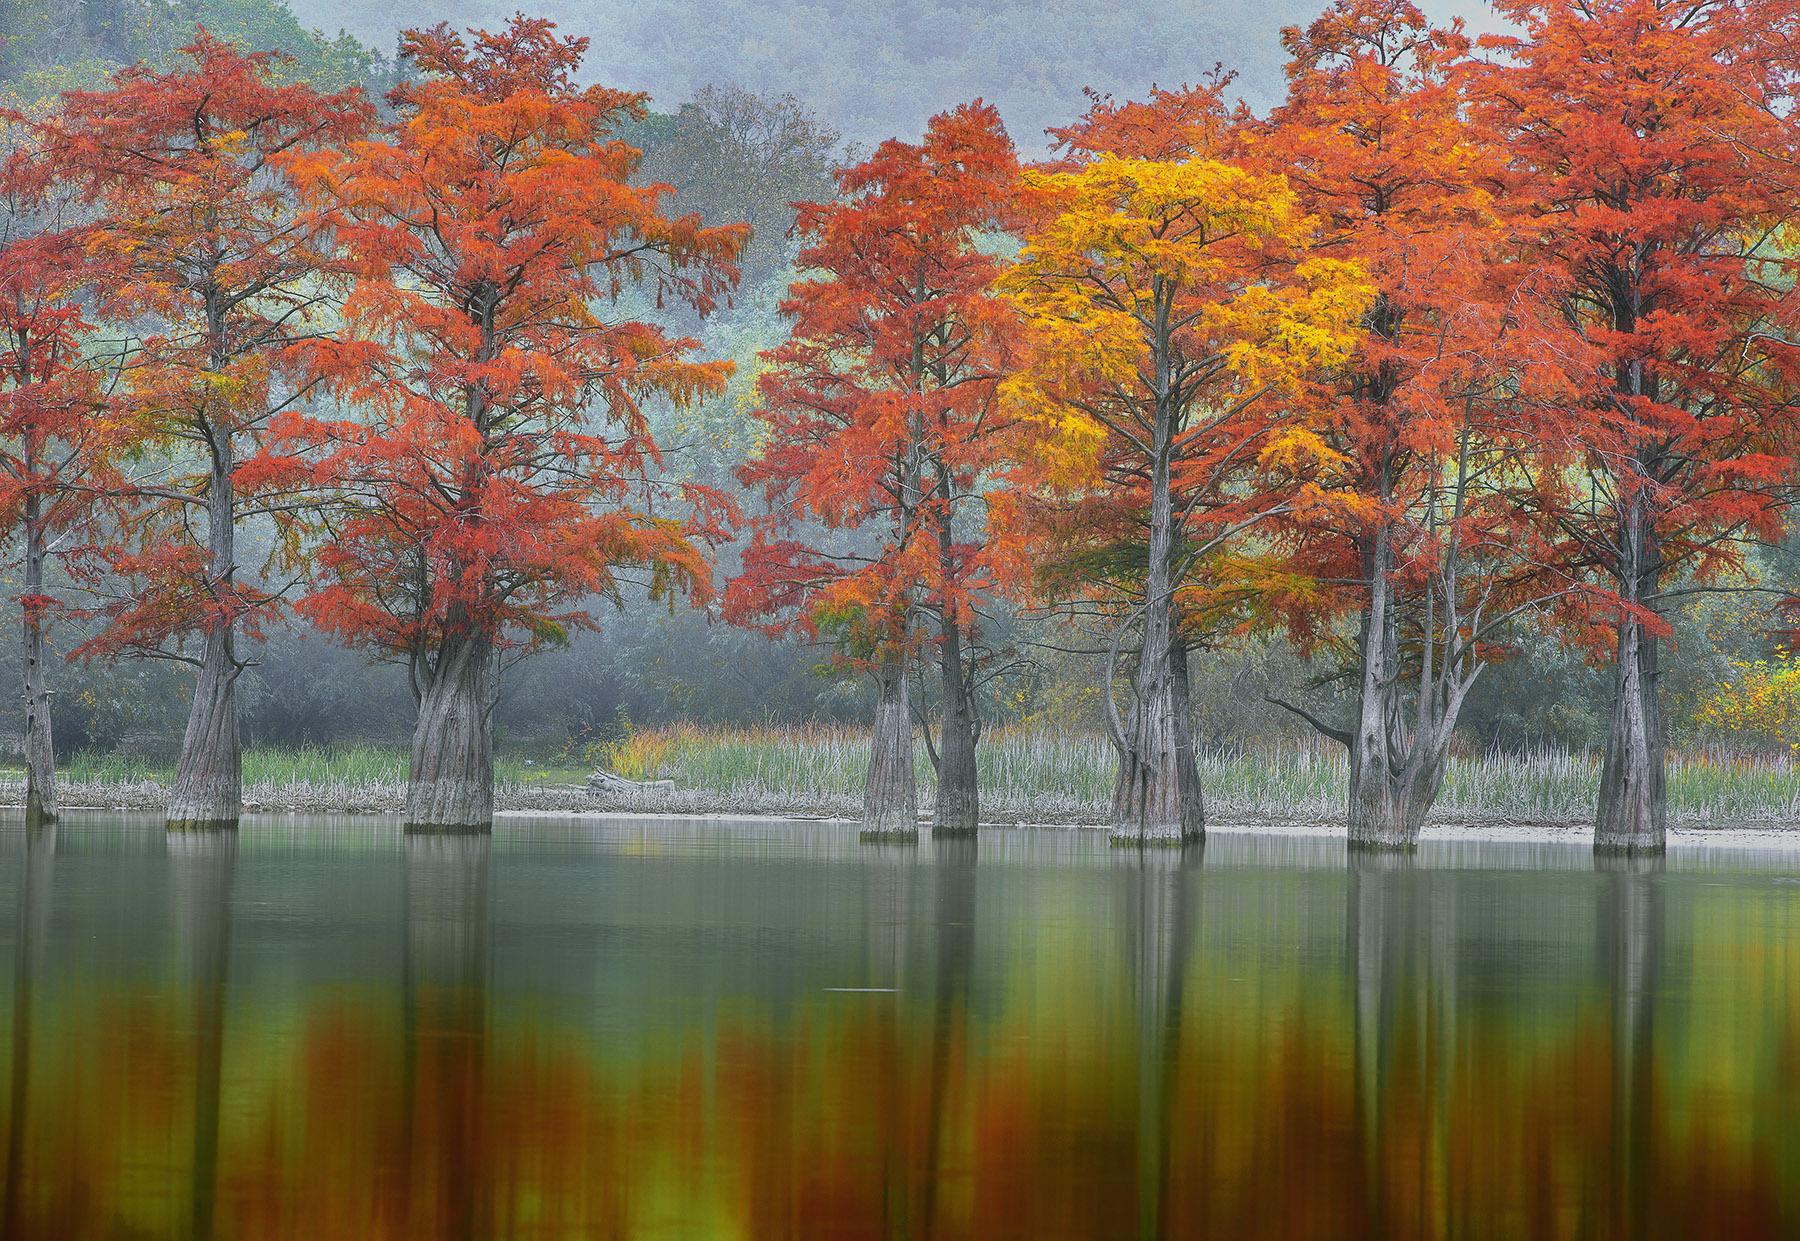 Cypress trees mangrove